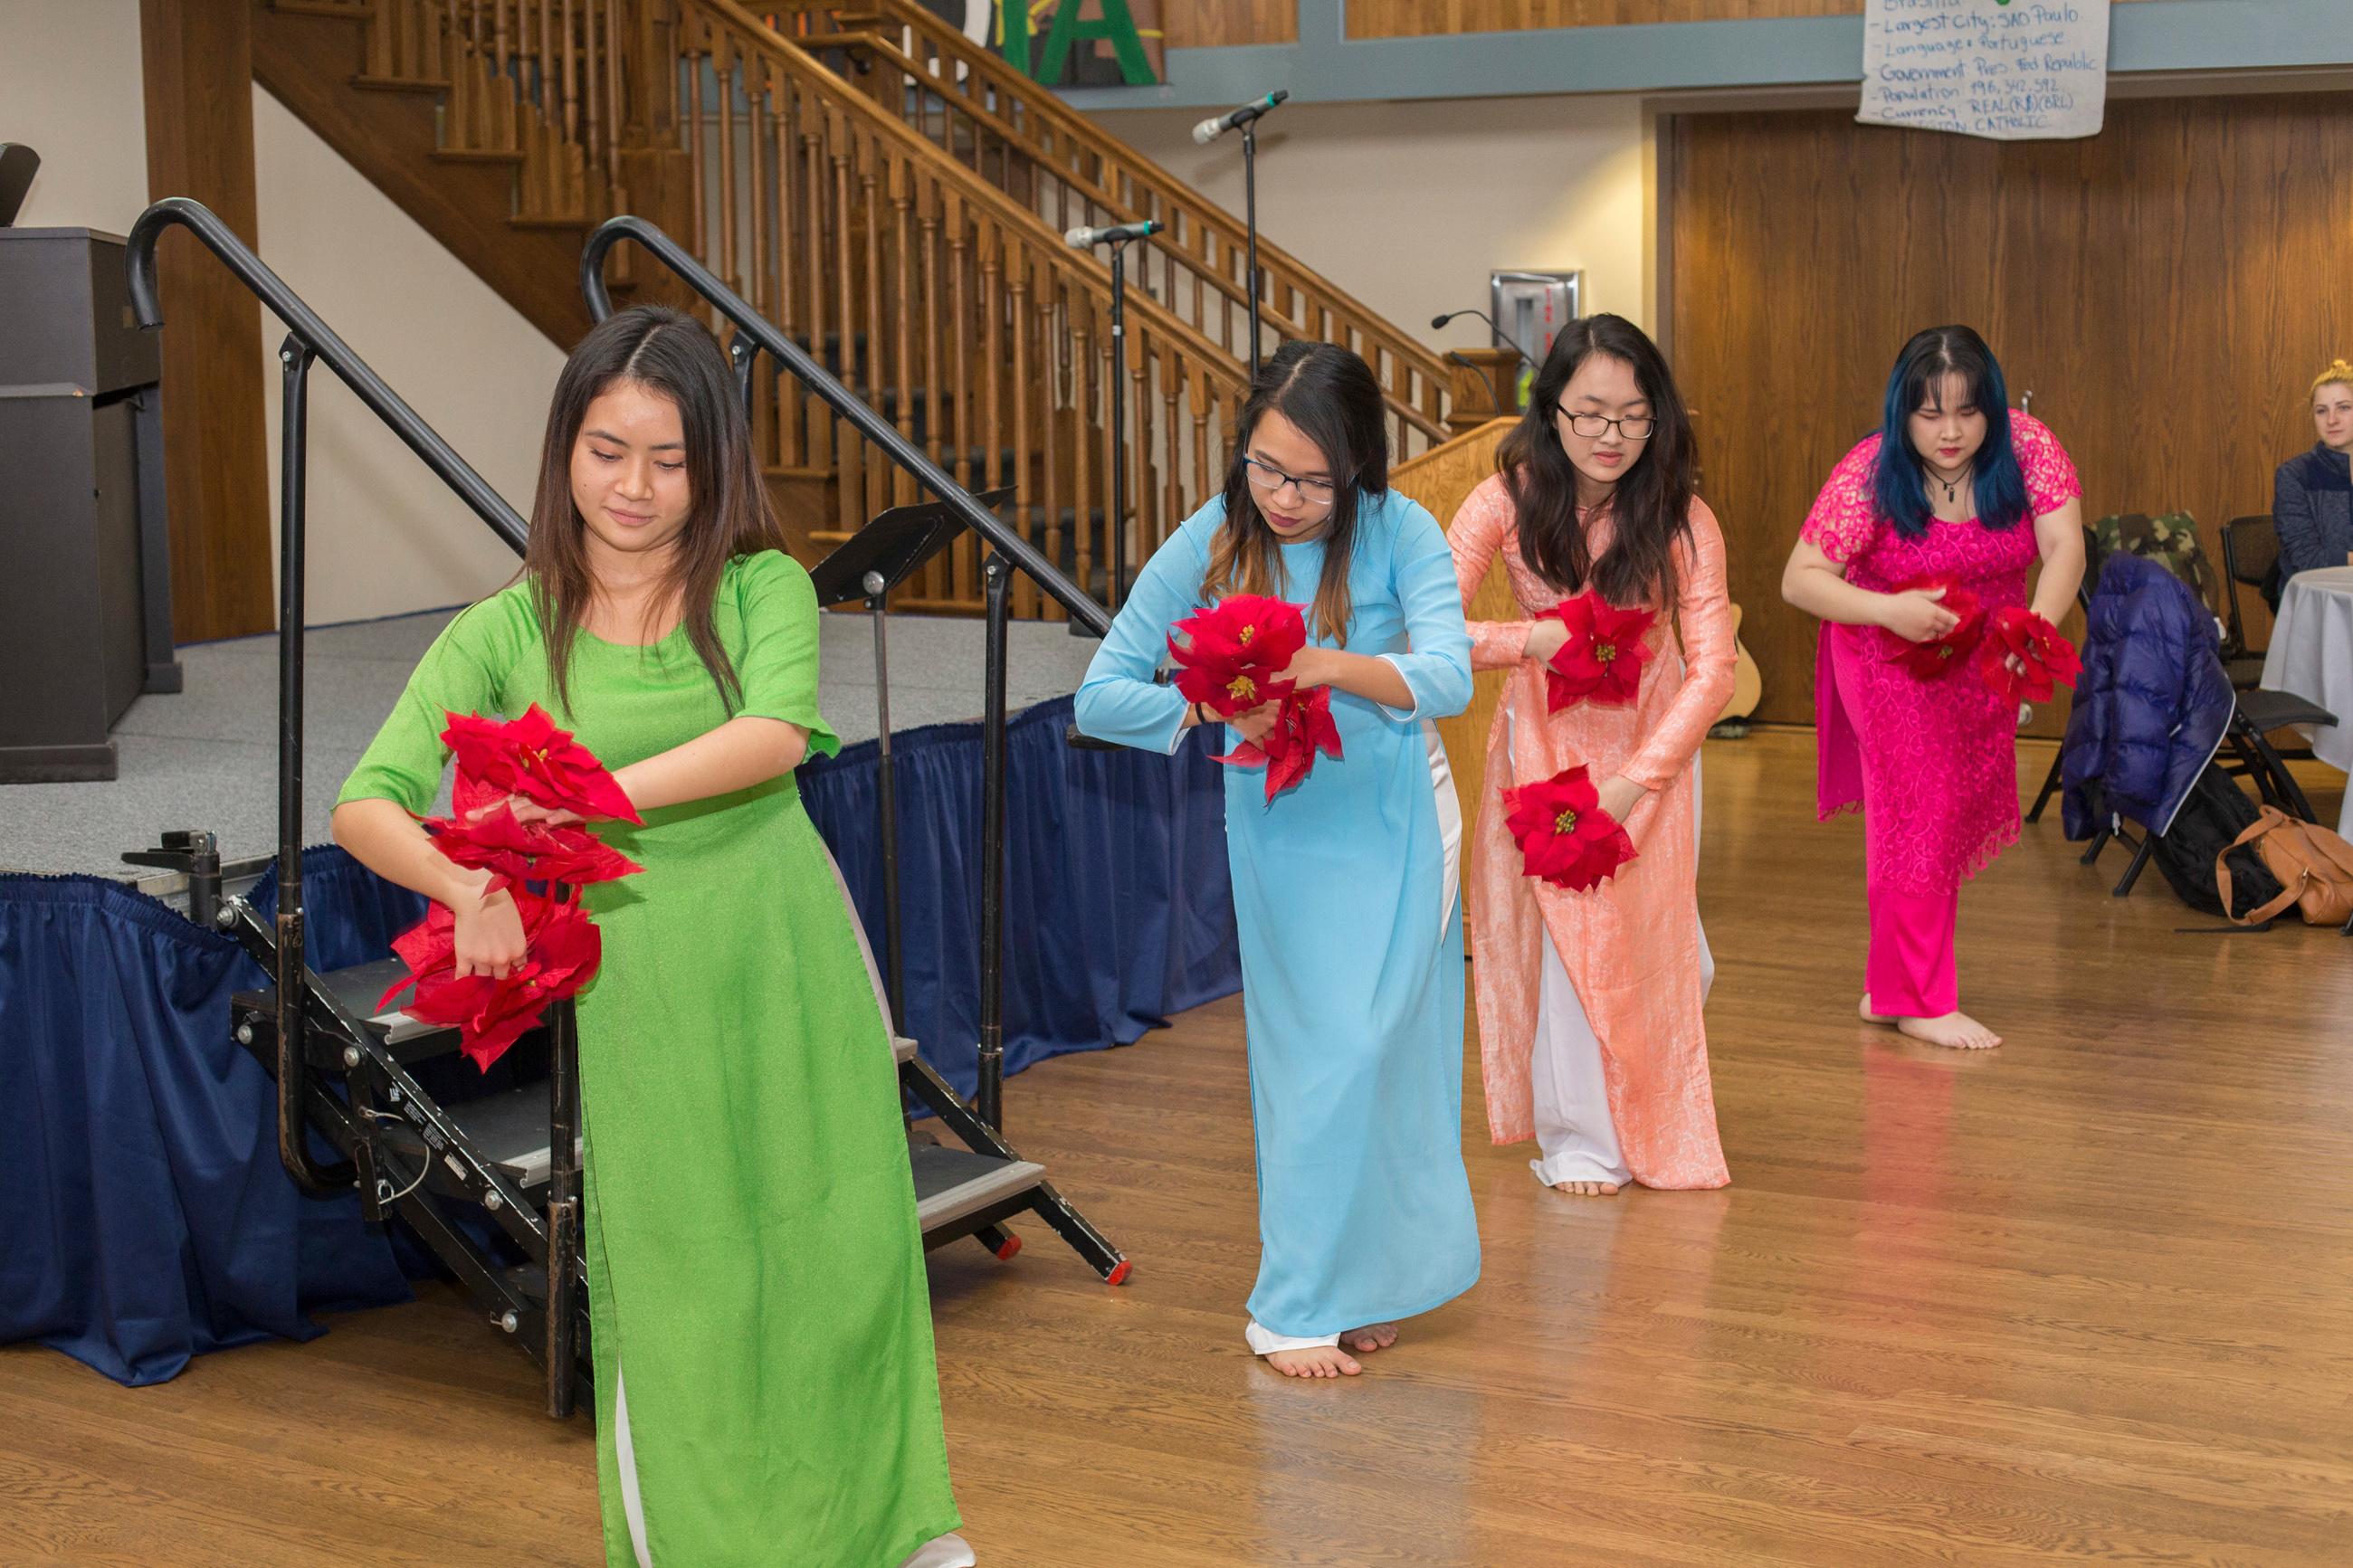 'Extravaganza' showcases Columbia College international population